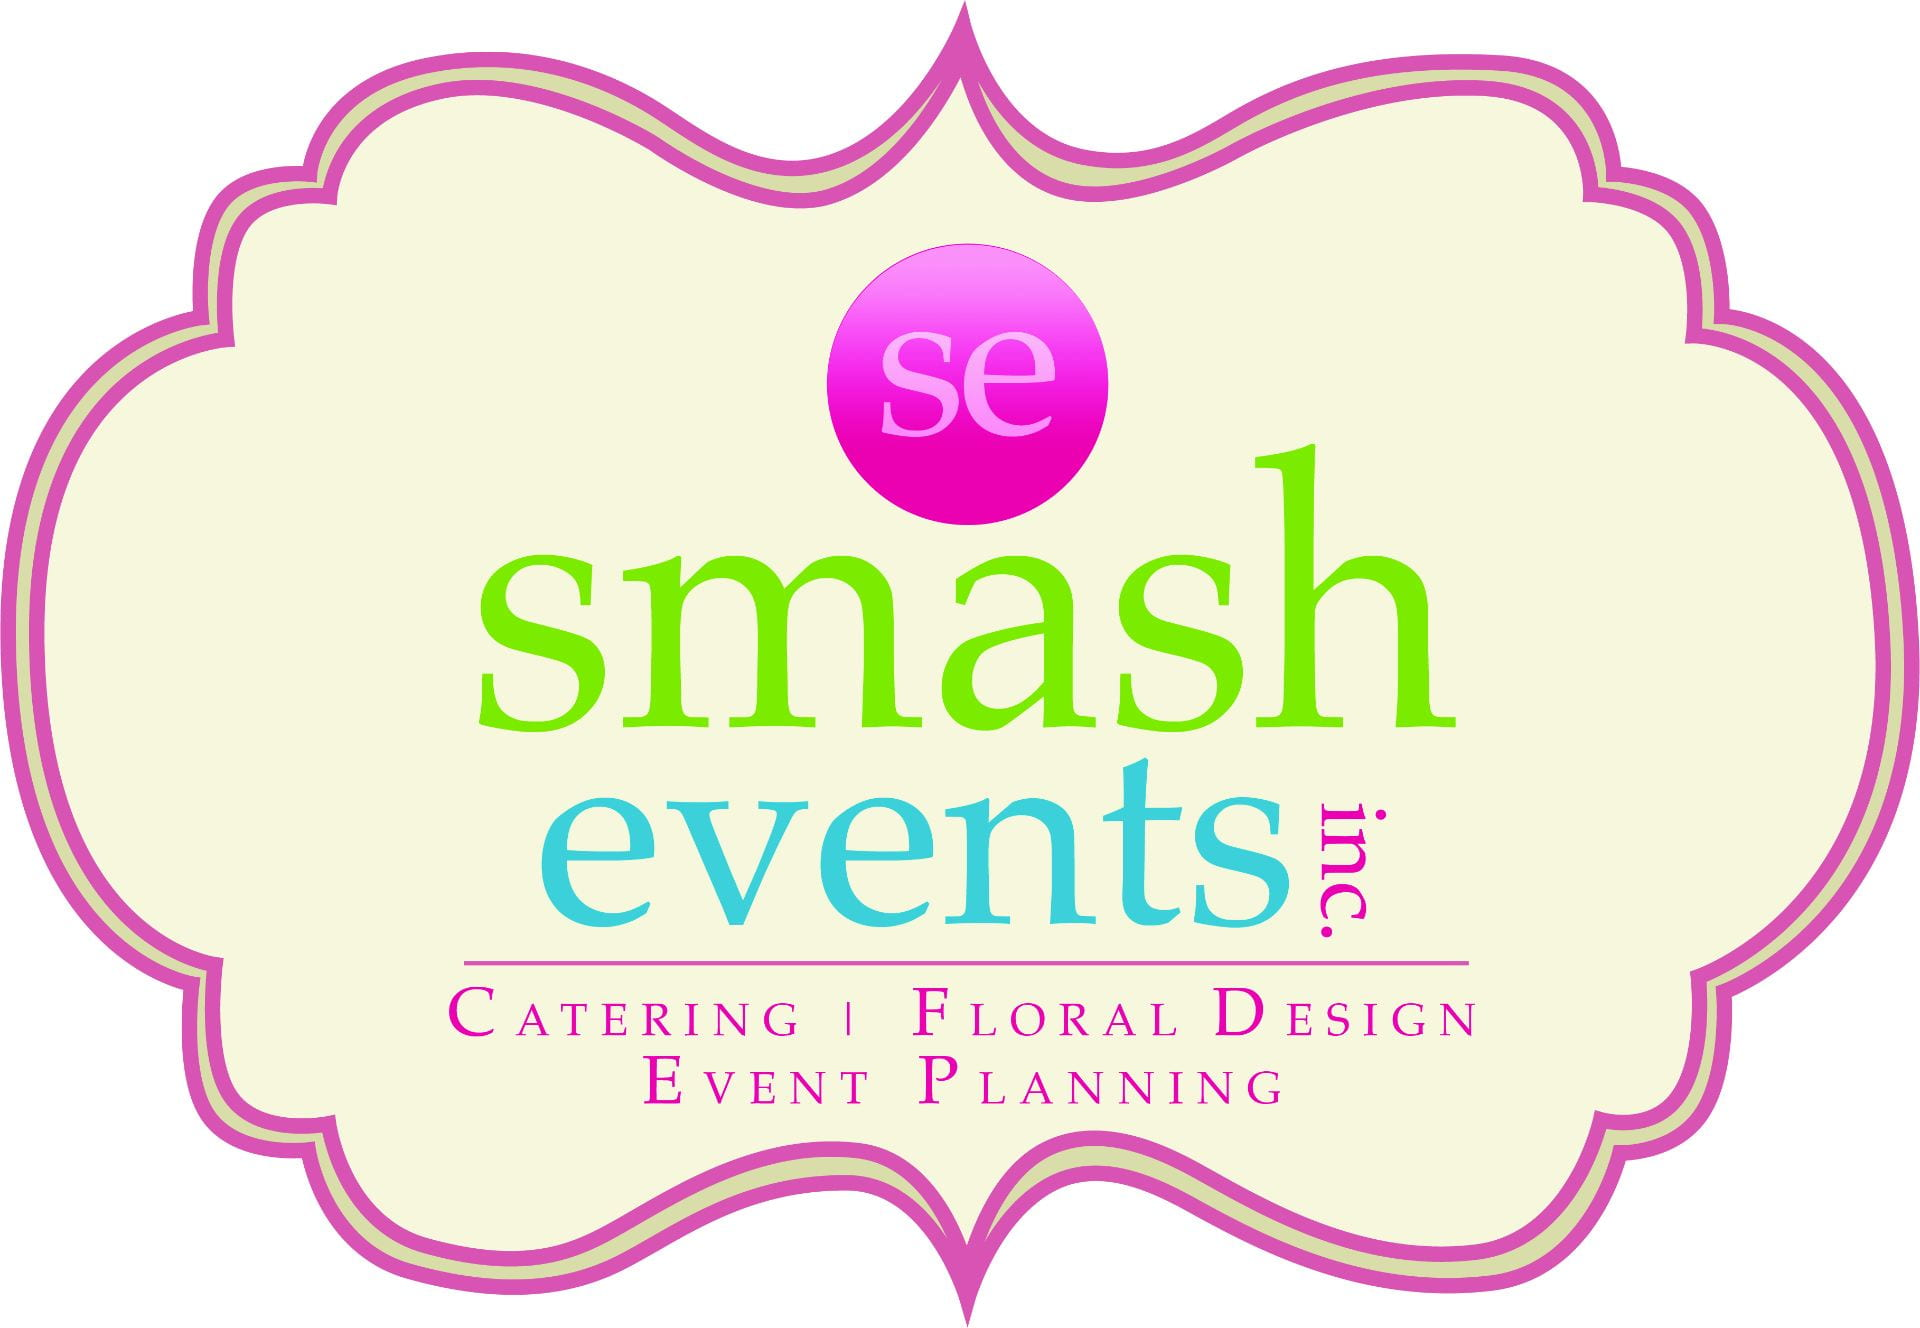 Smash Events logo